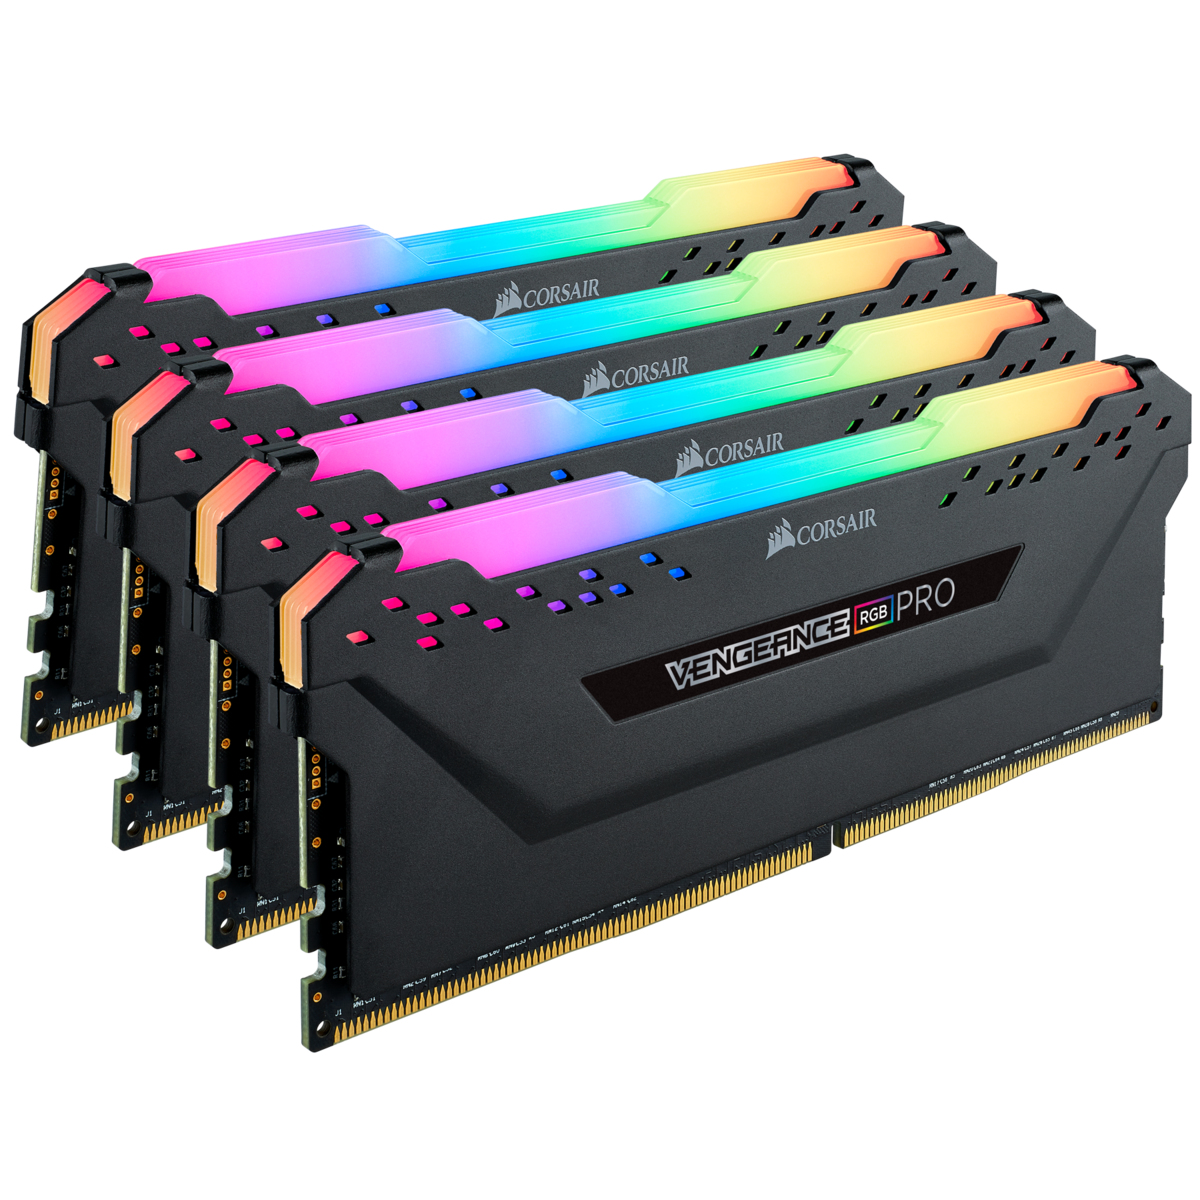 Corsair Vengeance RGB PRO - DDR4 - 64 GB: 4 x 16 GB